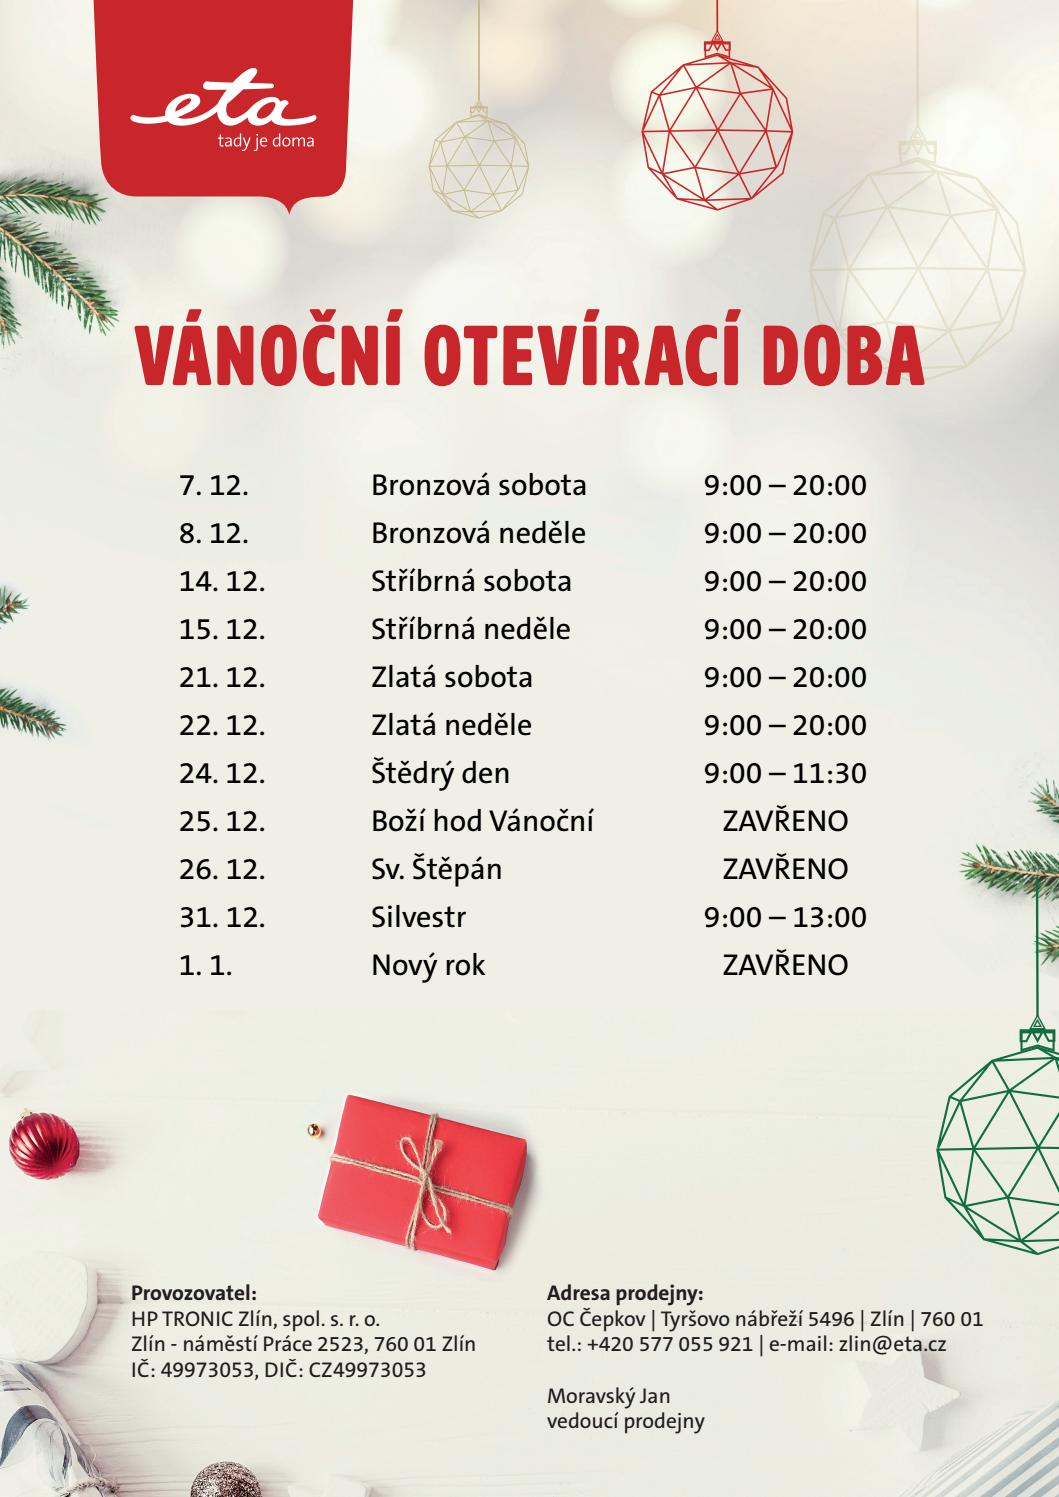 Eta Znackova Prodejna Zlin Oc Cepkov By Eta Cr Issuu